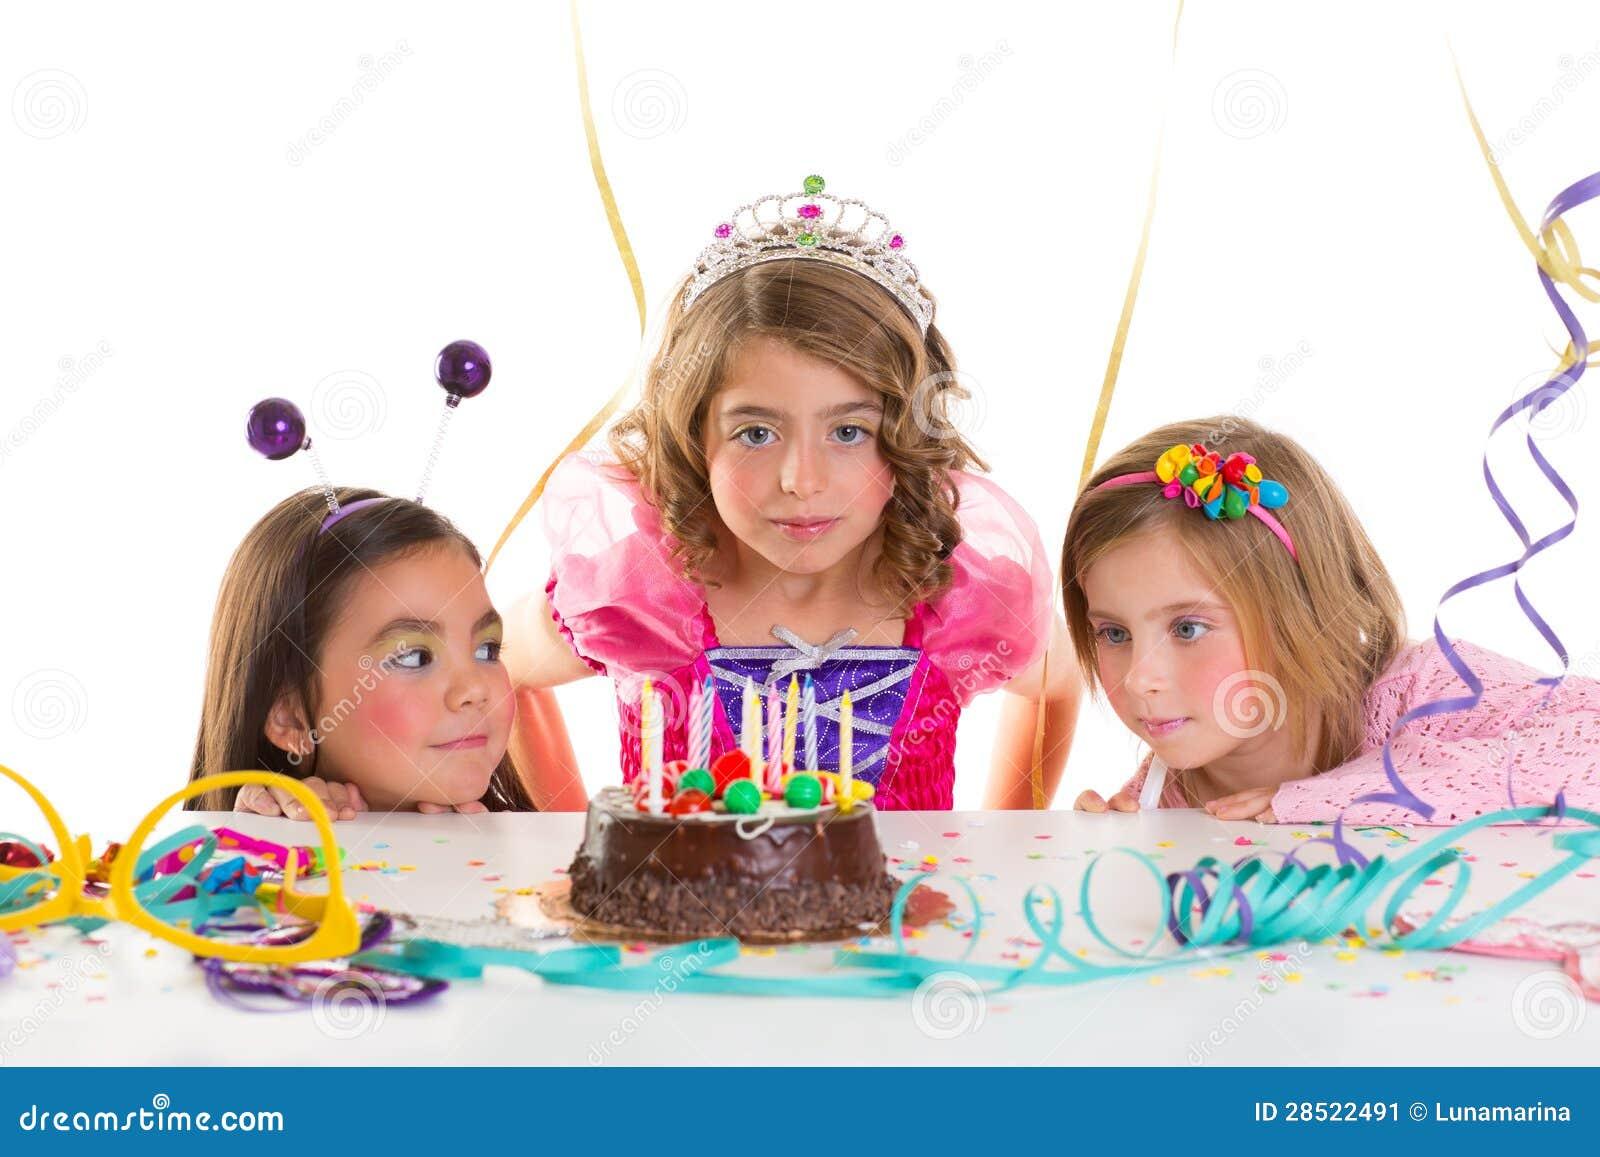 Children Kid Girls Birthday Party Look Excited Chocolate Cake Stock